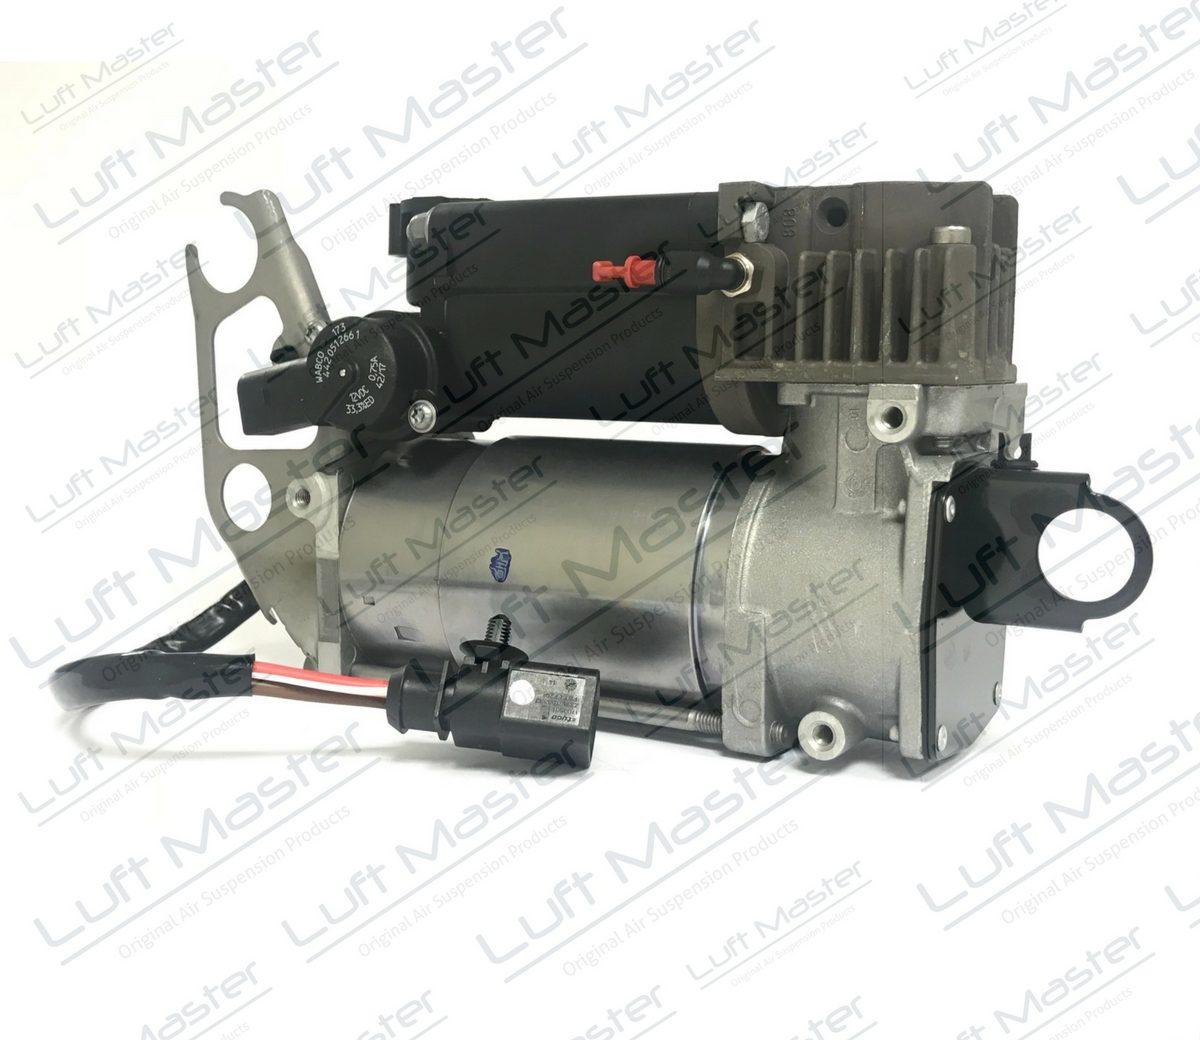 New original Porsche Cayenne air suspension compressor WABCO